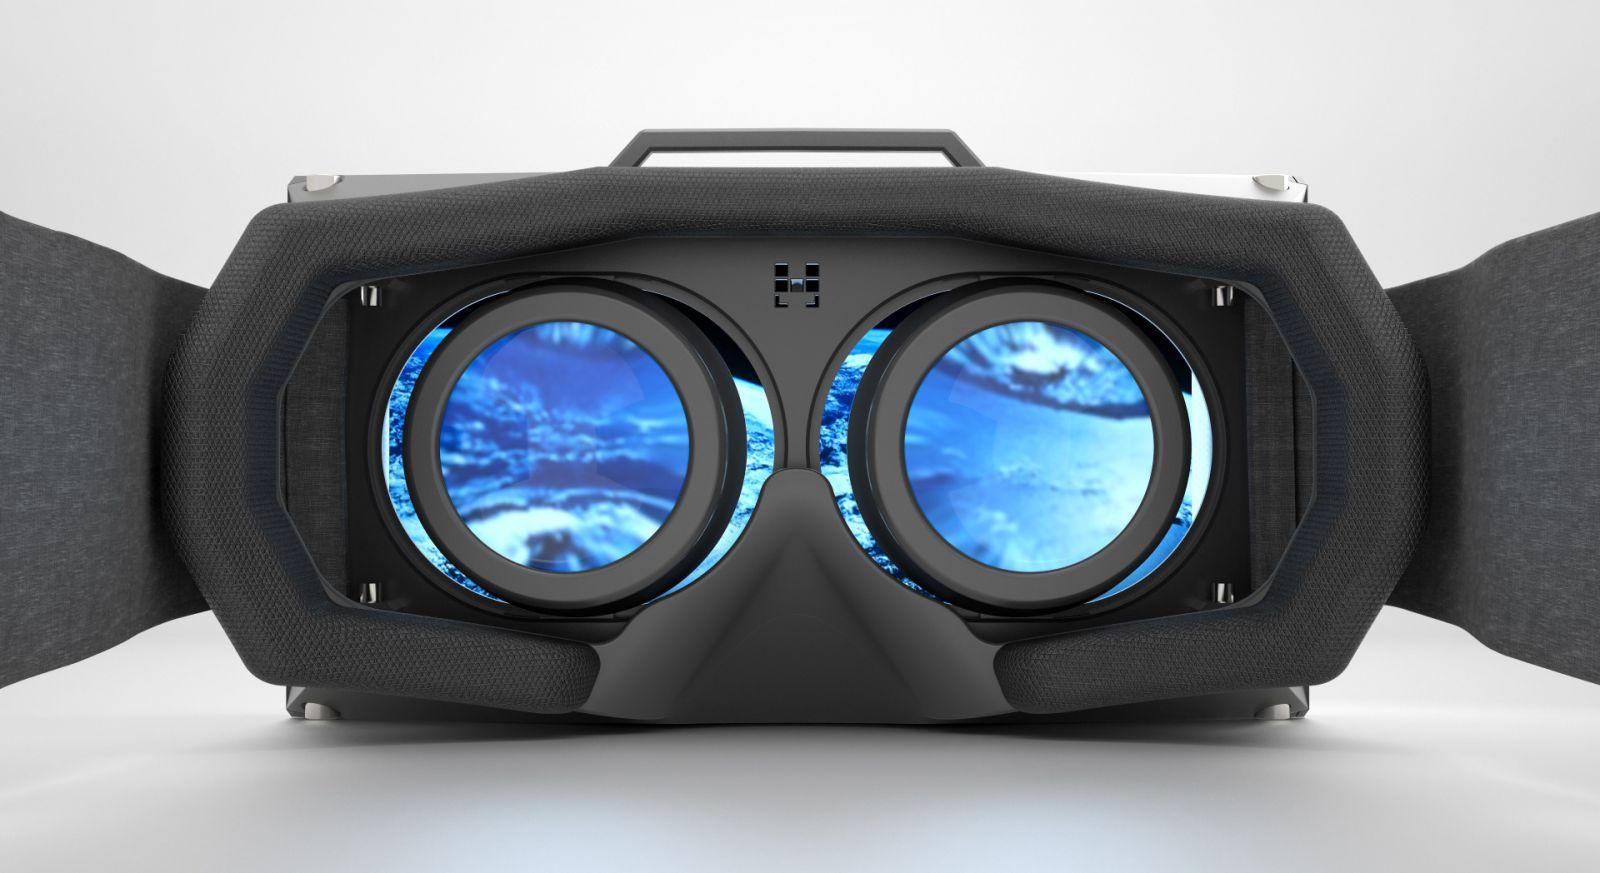 Oculus-Rift-image